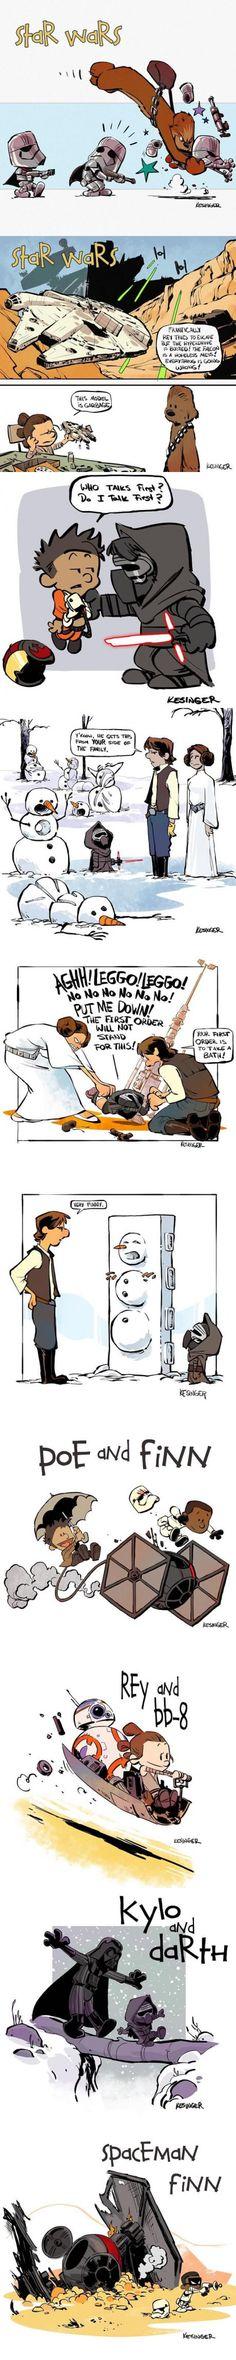 Calvin & Hobbes style Star Wars: The Force Awakens